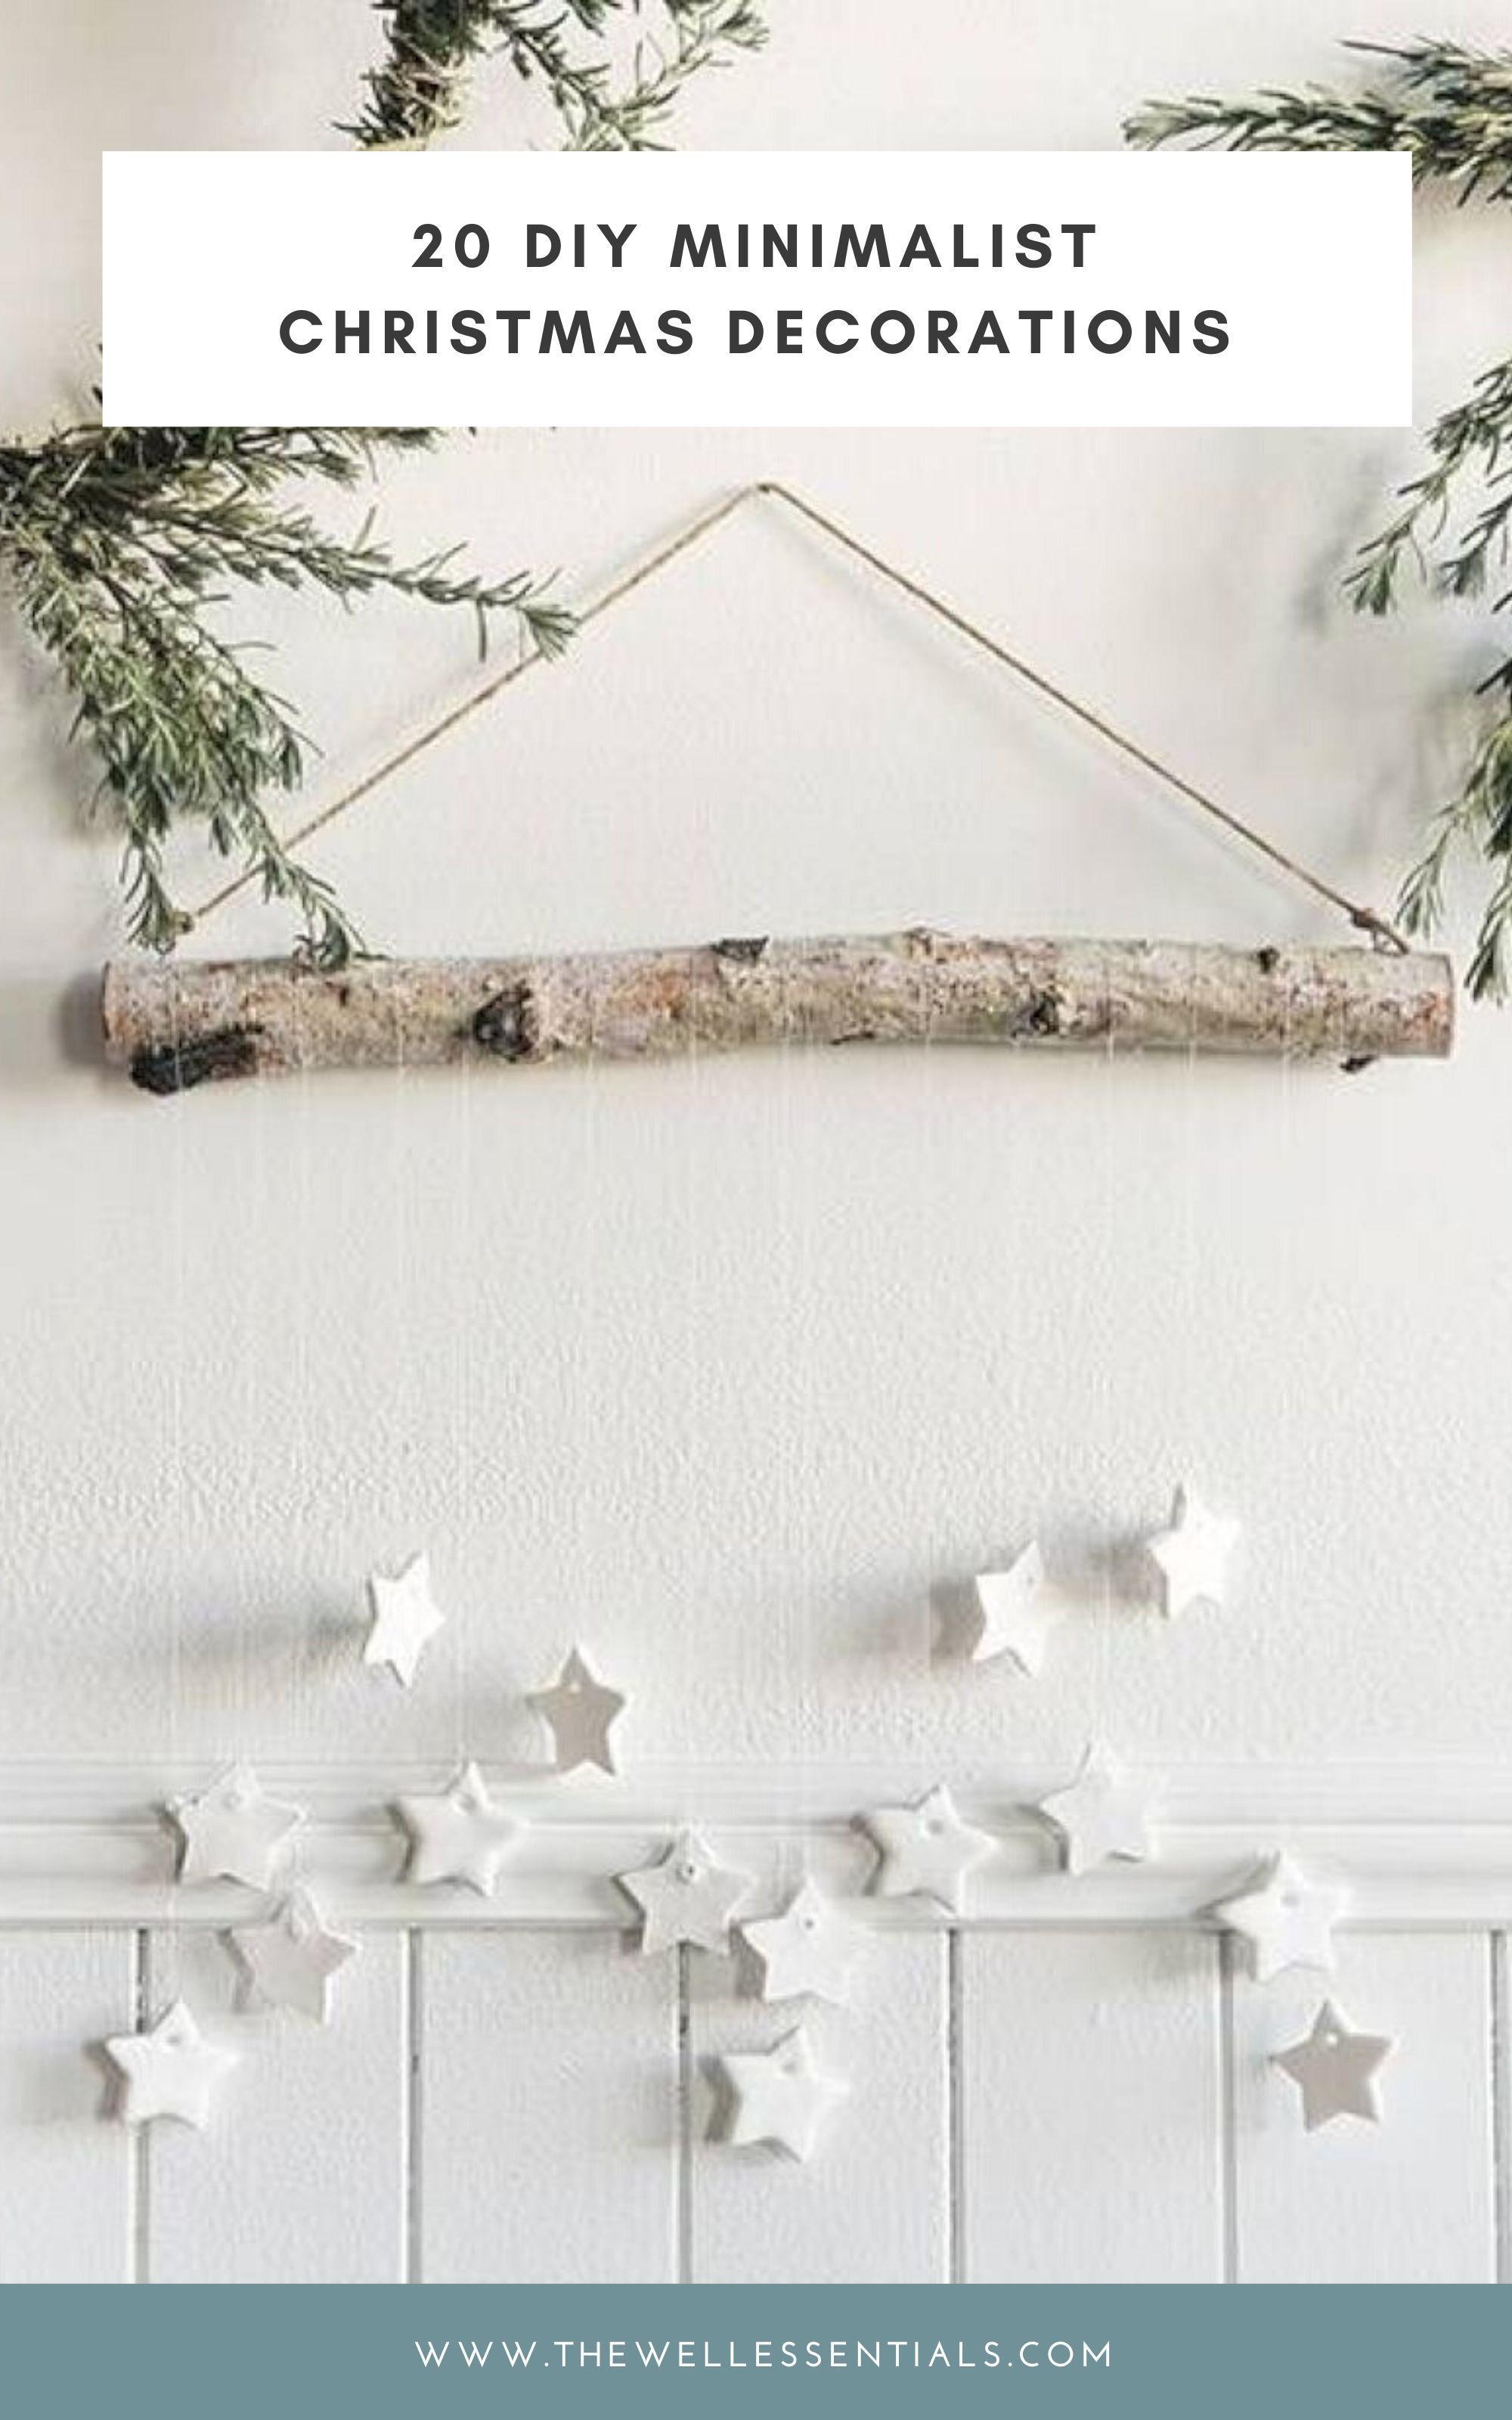 20 Minimalist Christmas Decor Diys Scandinavian Christmas Decorations Scandinavian Christmas Christmas Diy